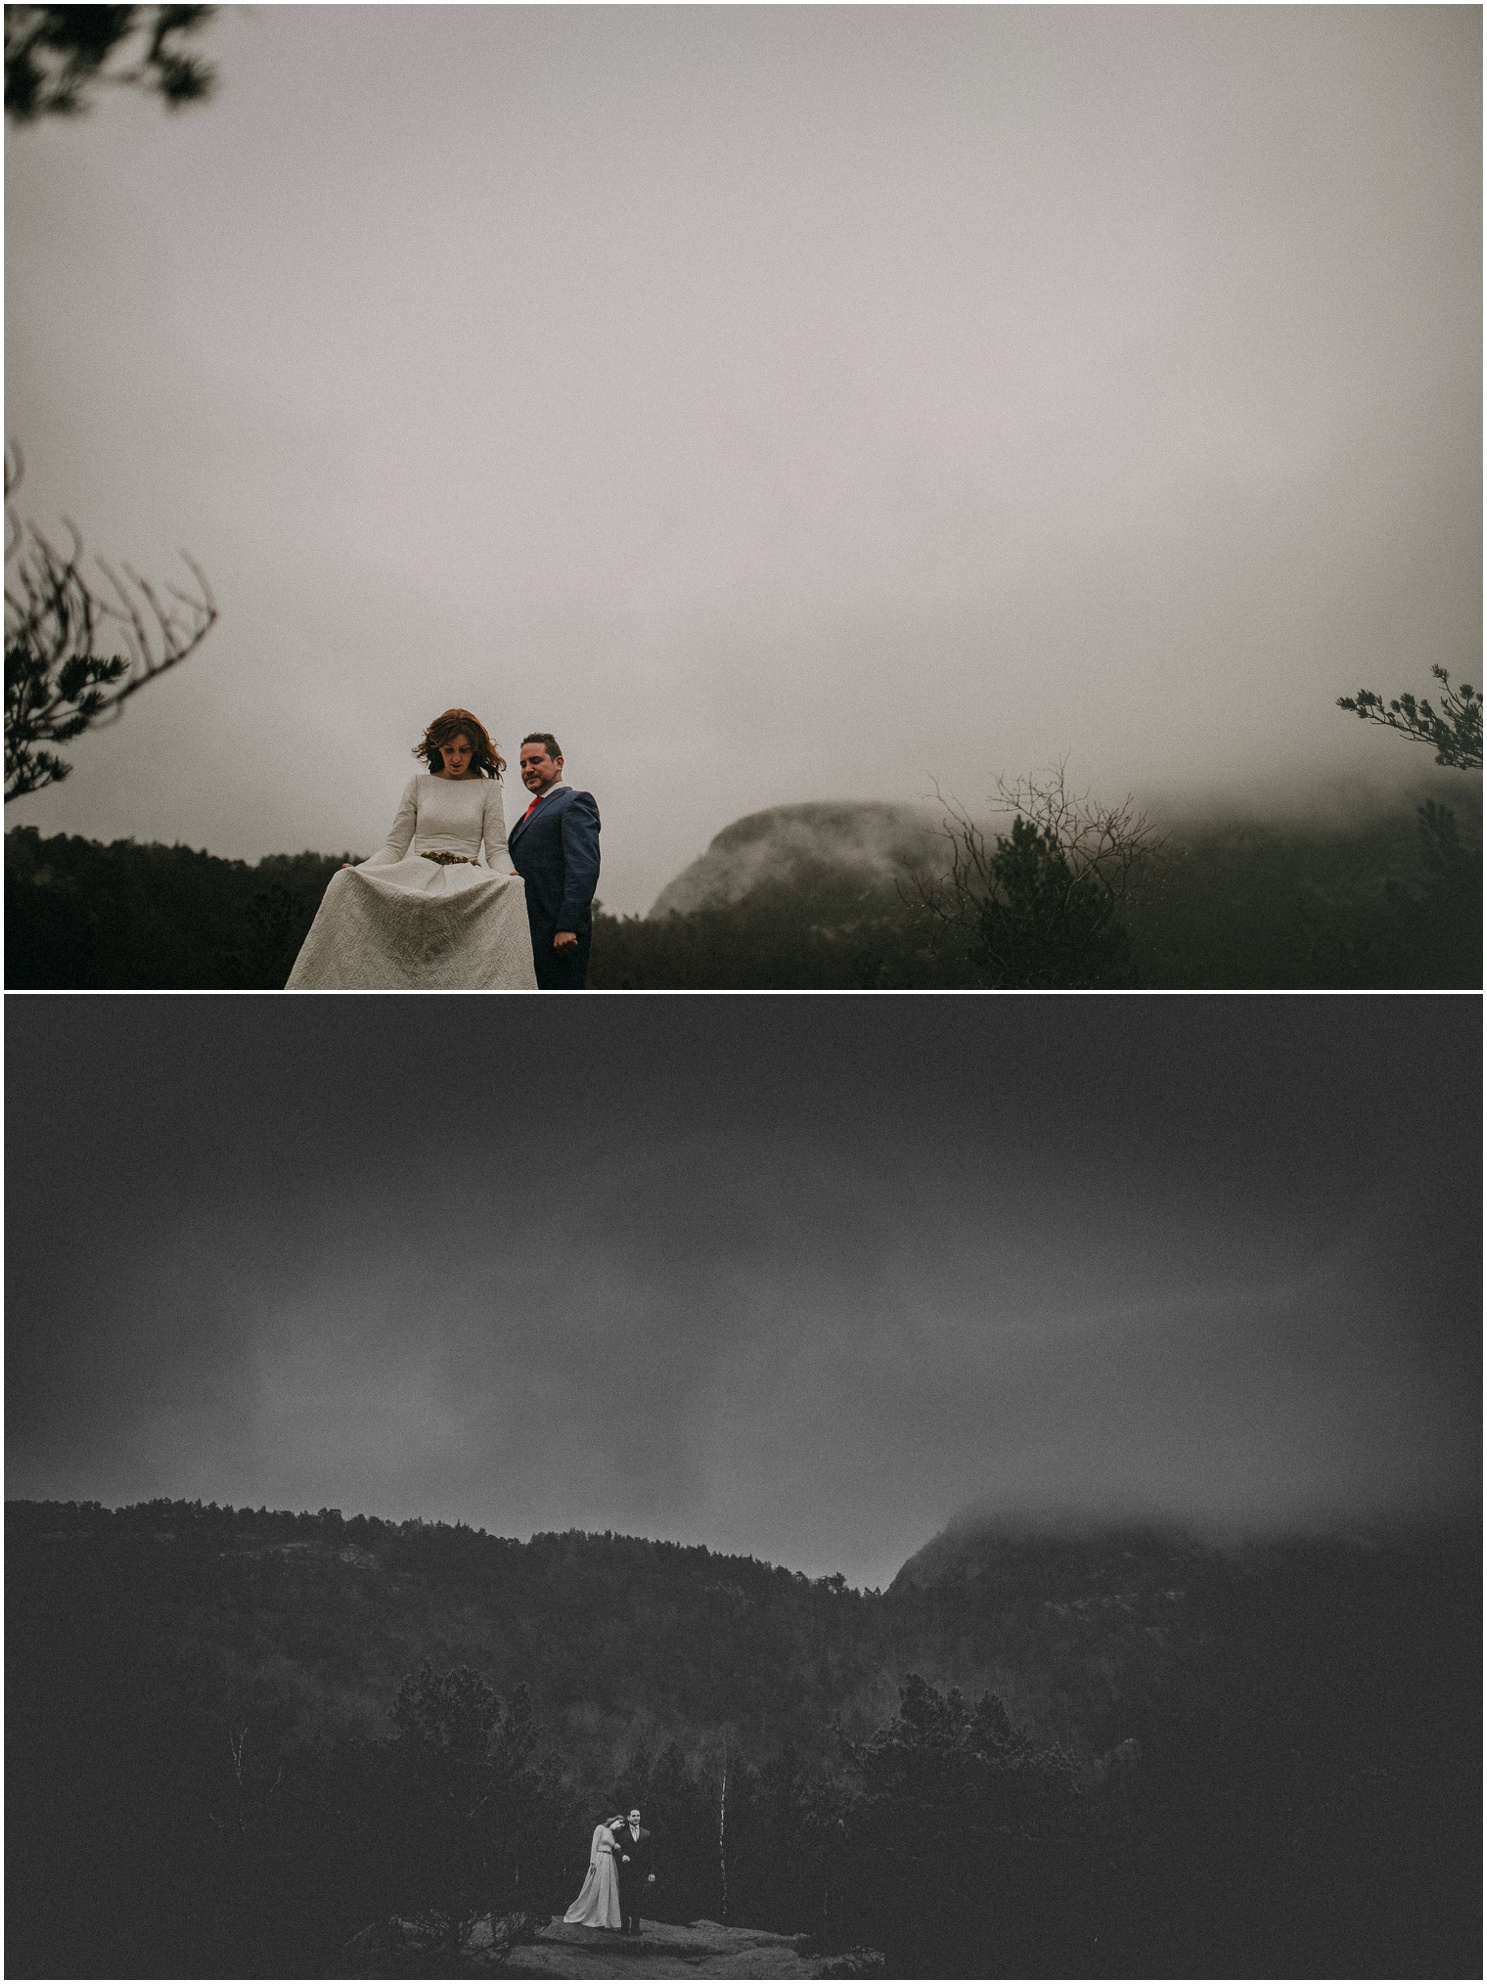 Pablo Laguia wedding phothograper in oslo-59.jpg